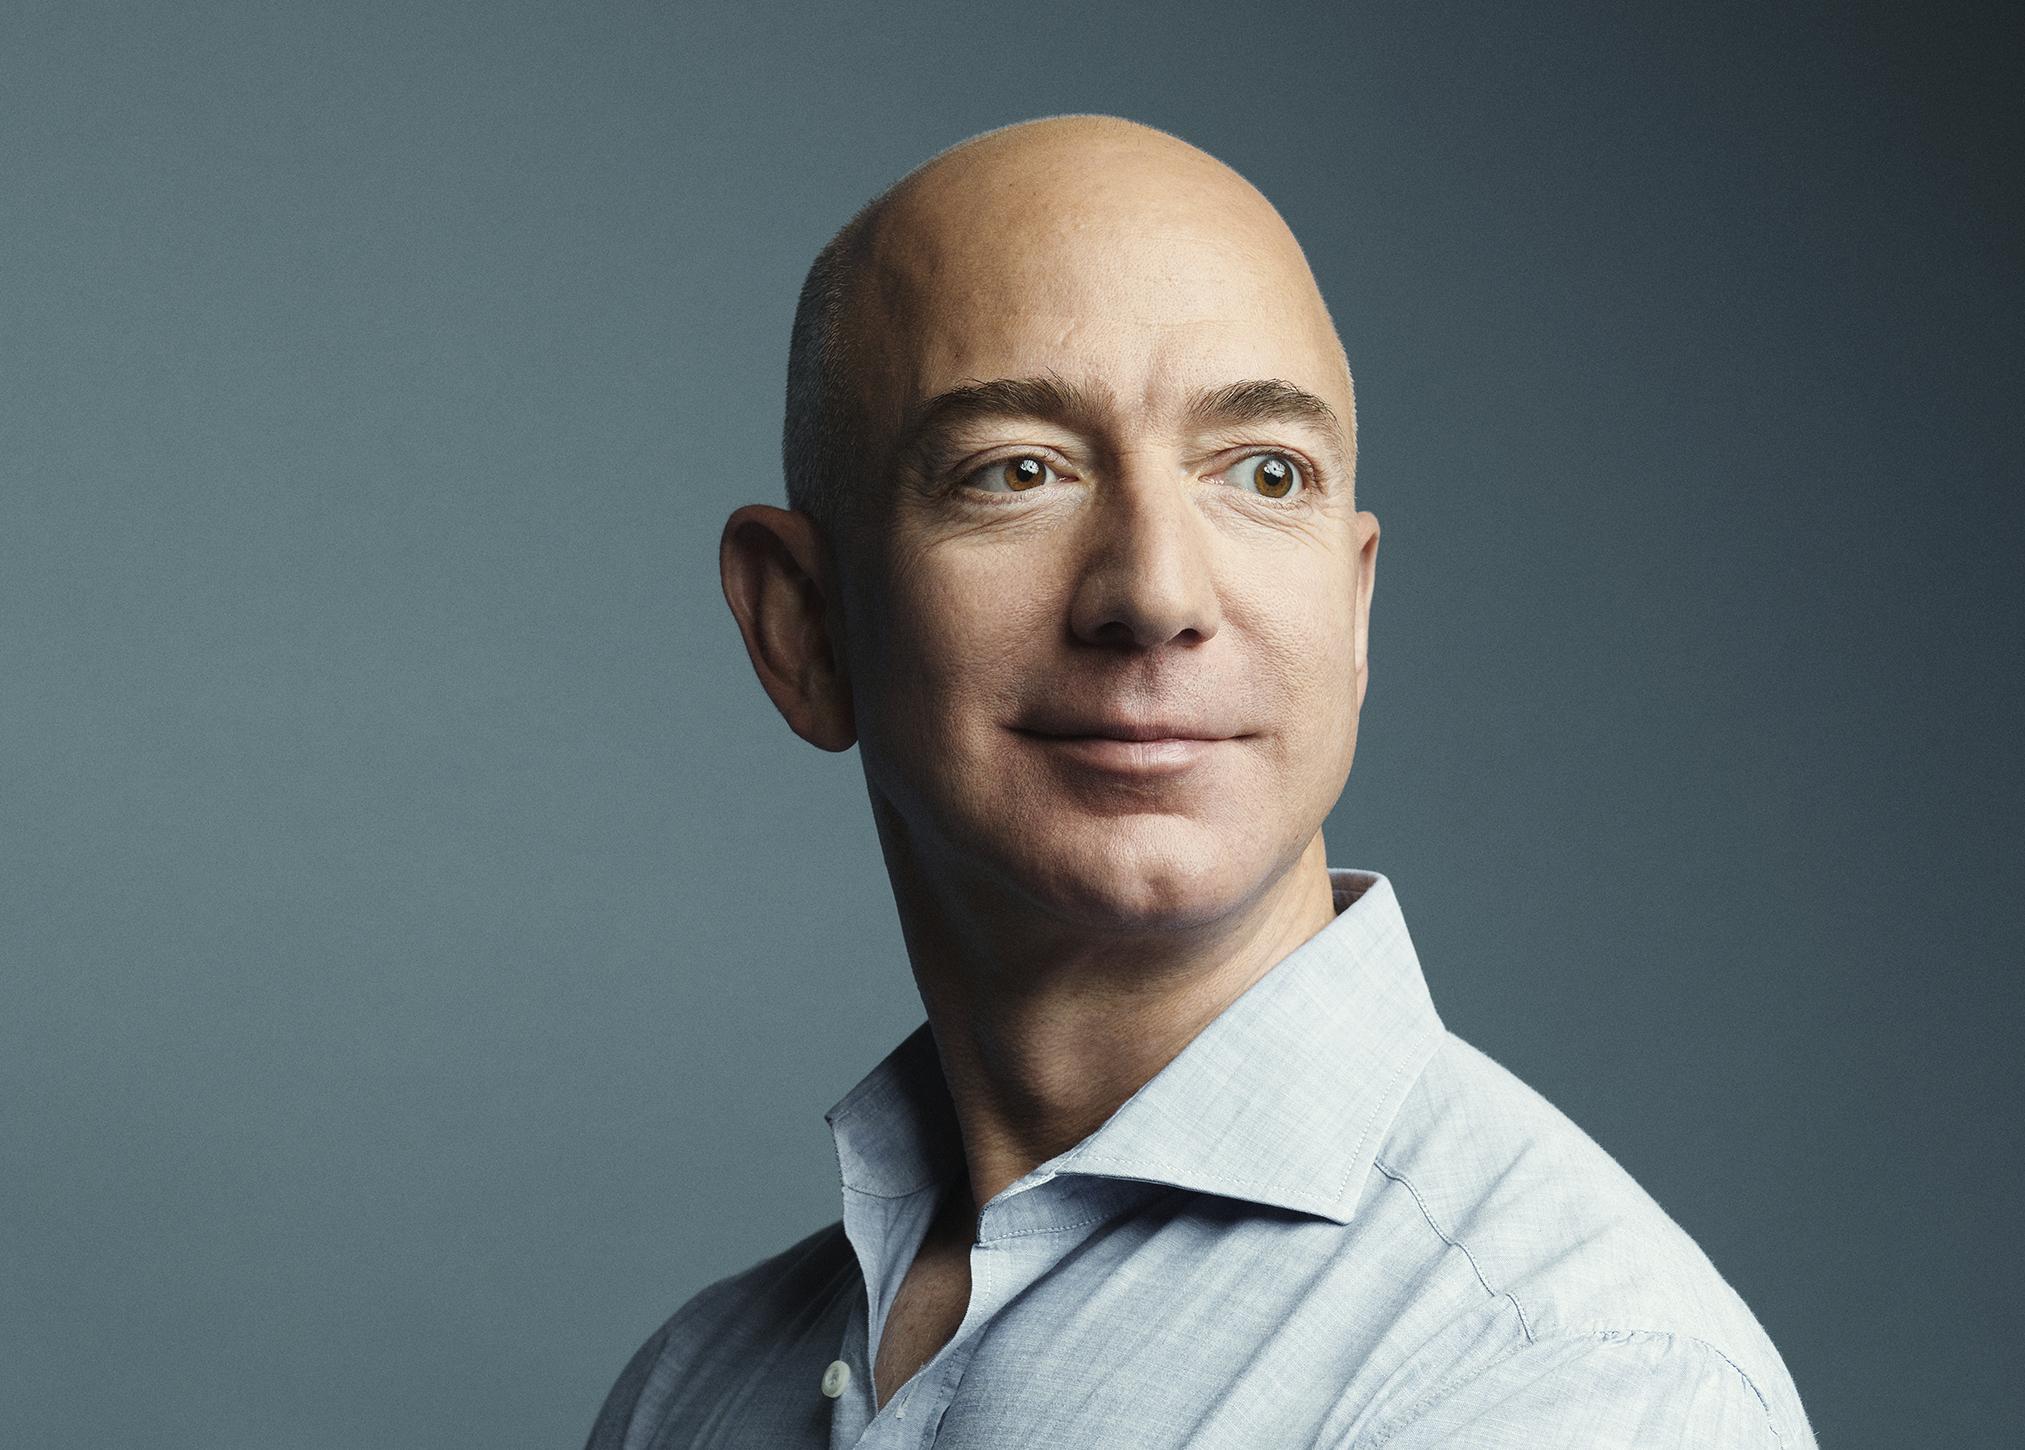 7 nezvyčnyh faktiv pro CEO Amazon